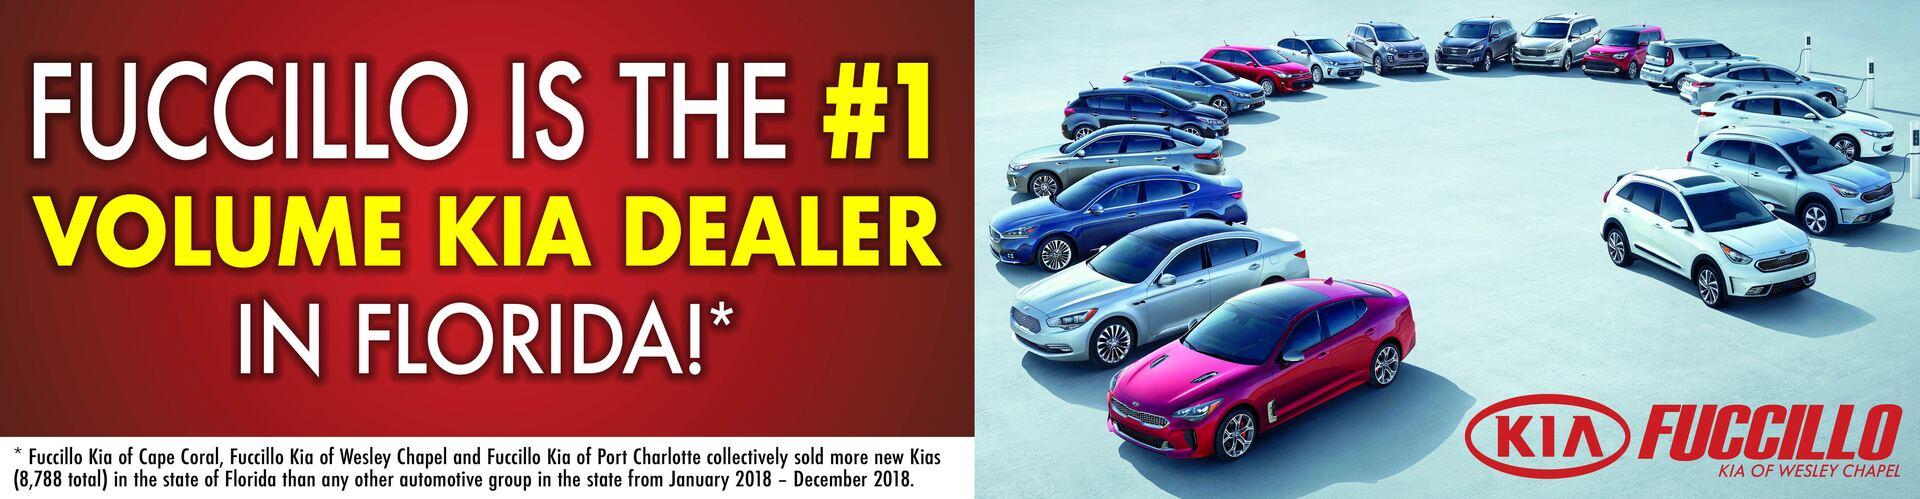 1 Volume Kia Dealer